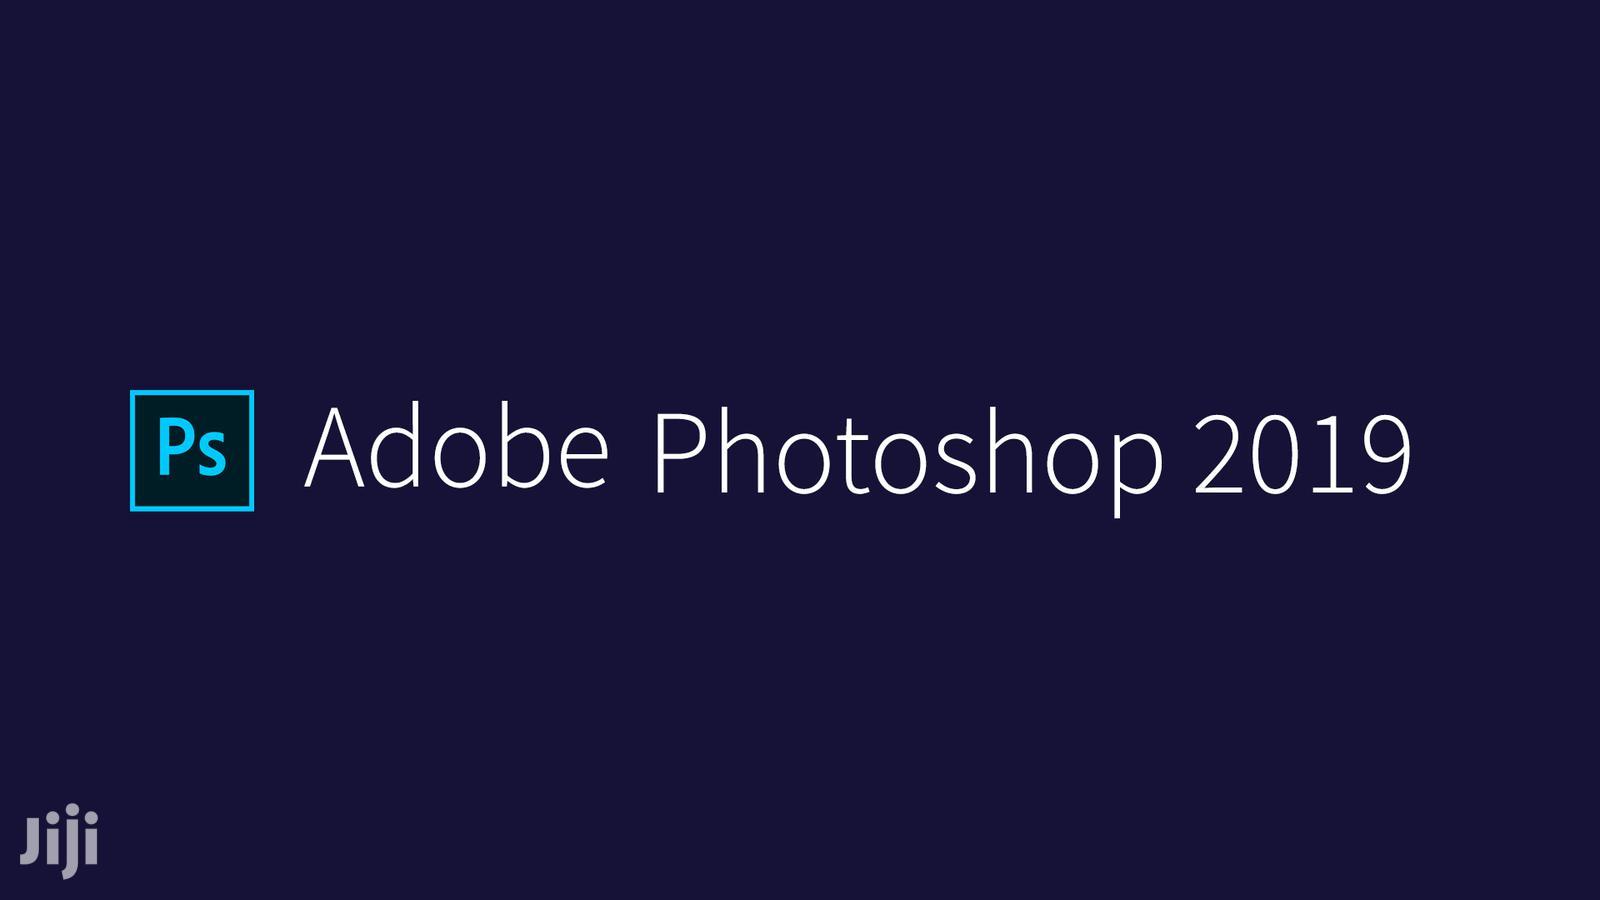 Archive: Adobe Photoshop CC 2019